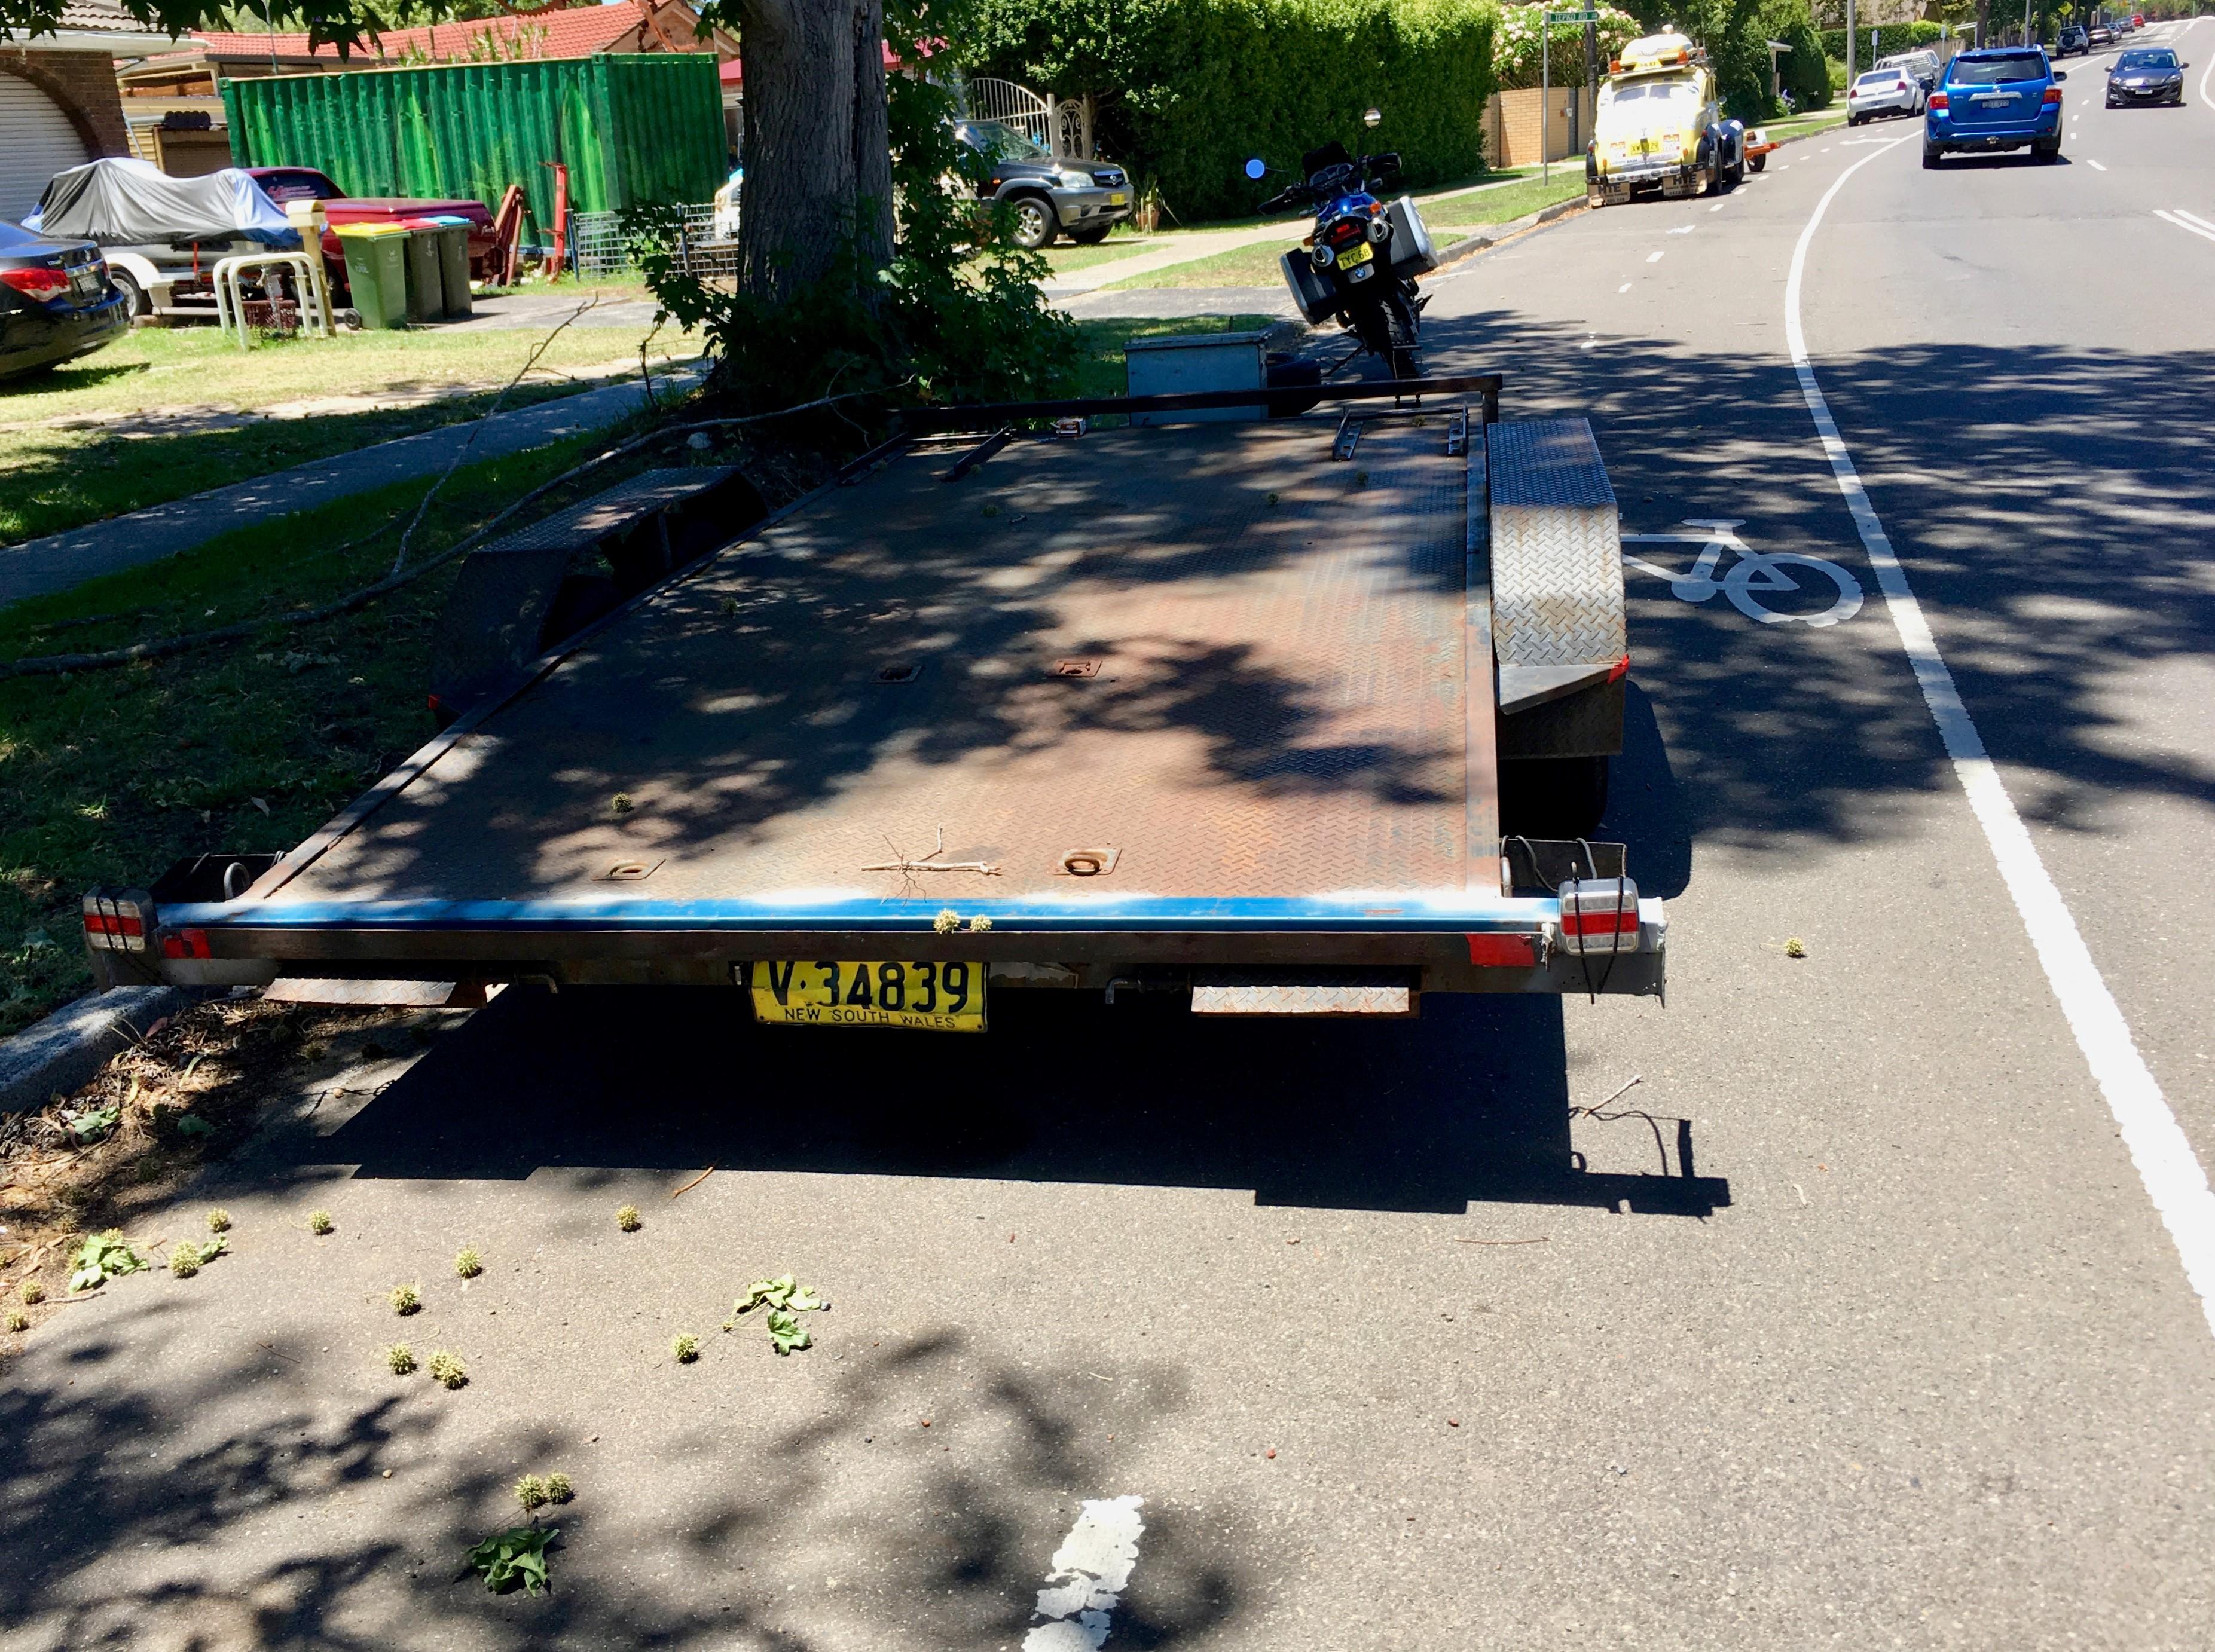 trailer parked